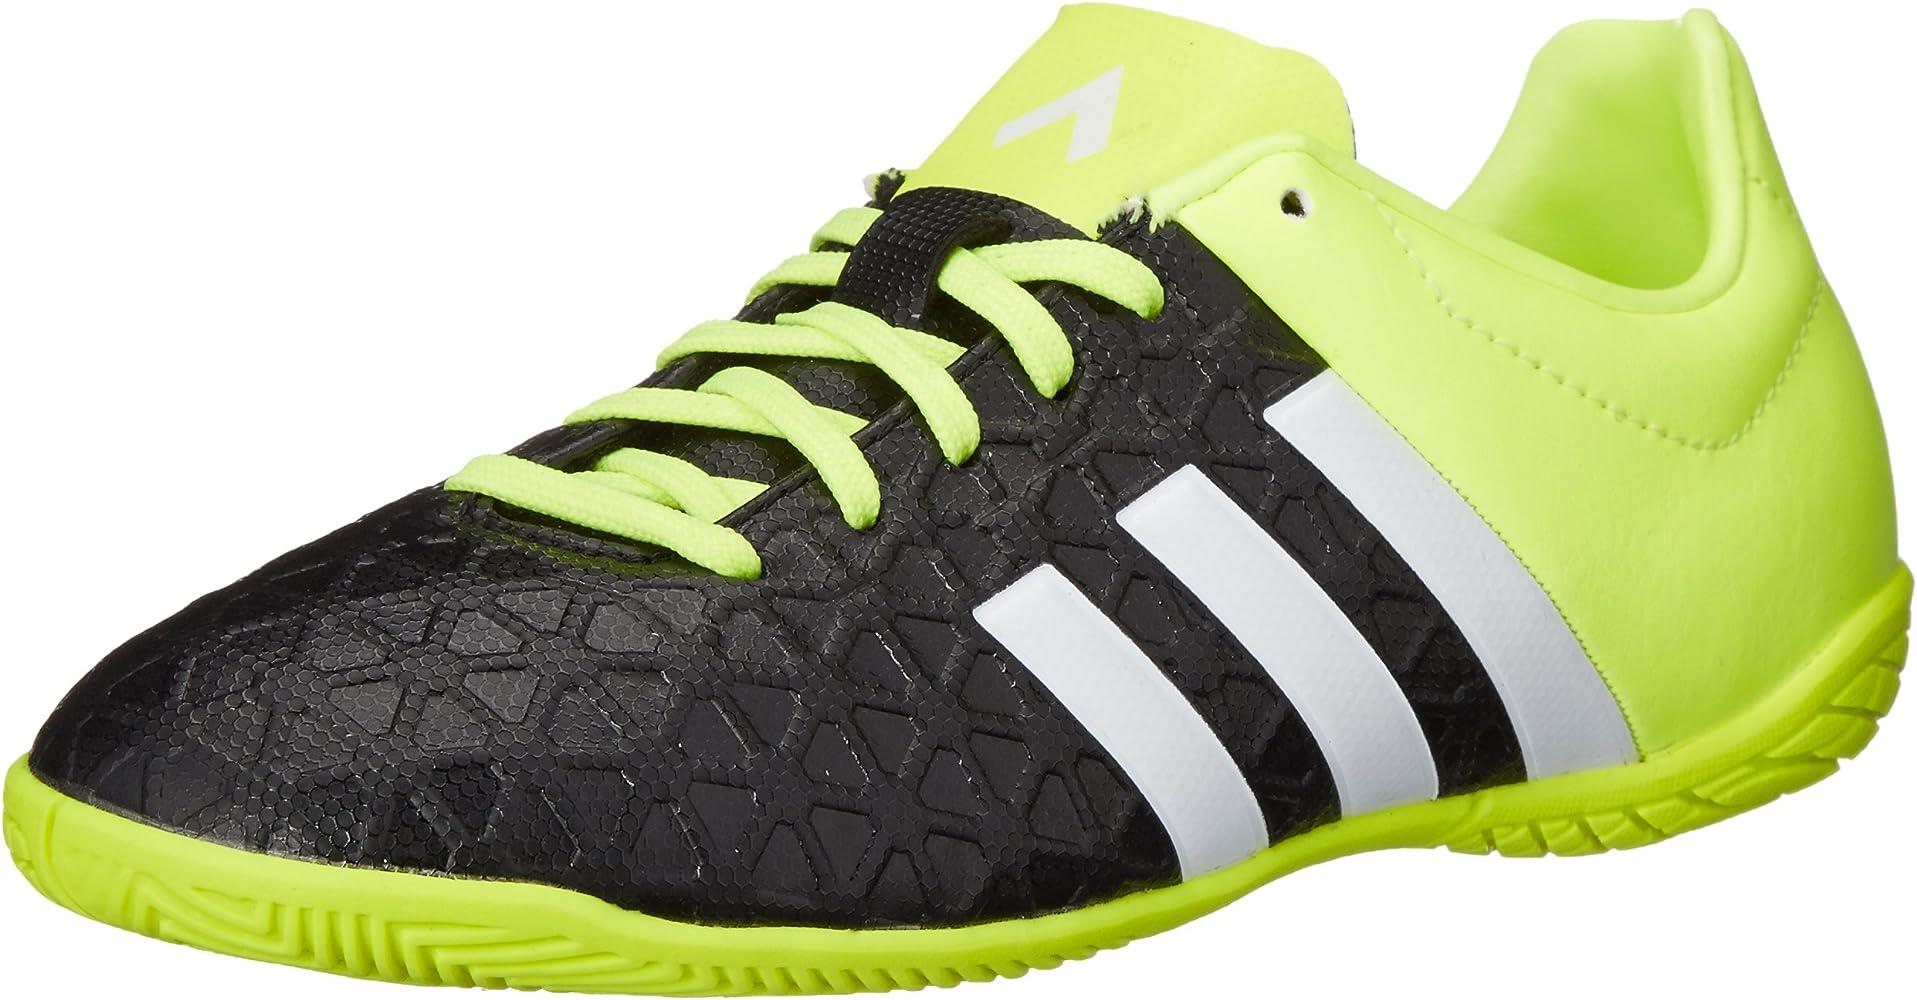 adidas Performance Ace 15.4 Indoor Soccer Shoe (Little Kid/Big Kid)